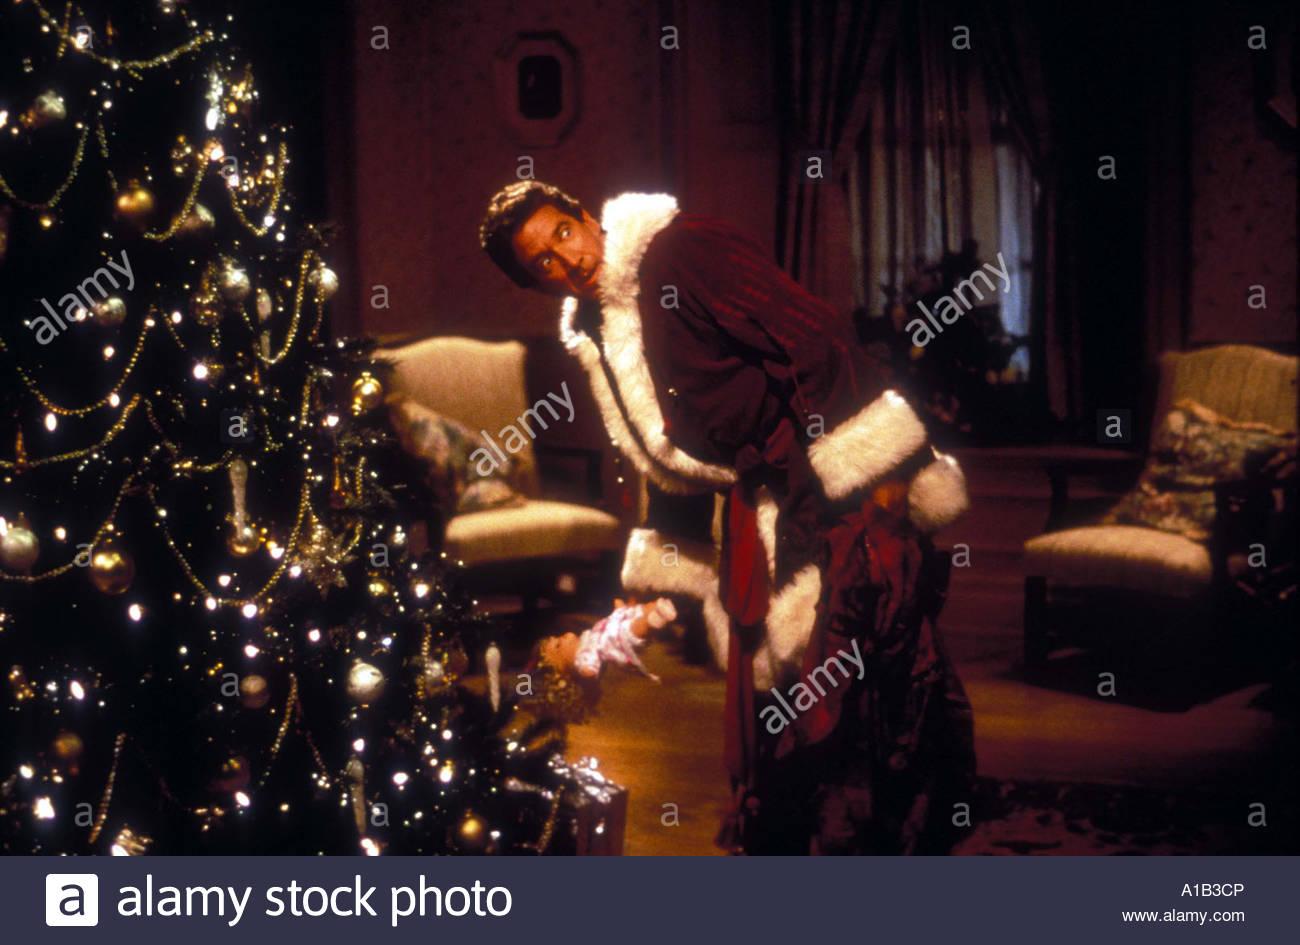 The Santa Clause Year 1994 Director John Pasquin Tim Allen - Stock Image